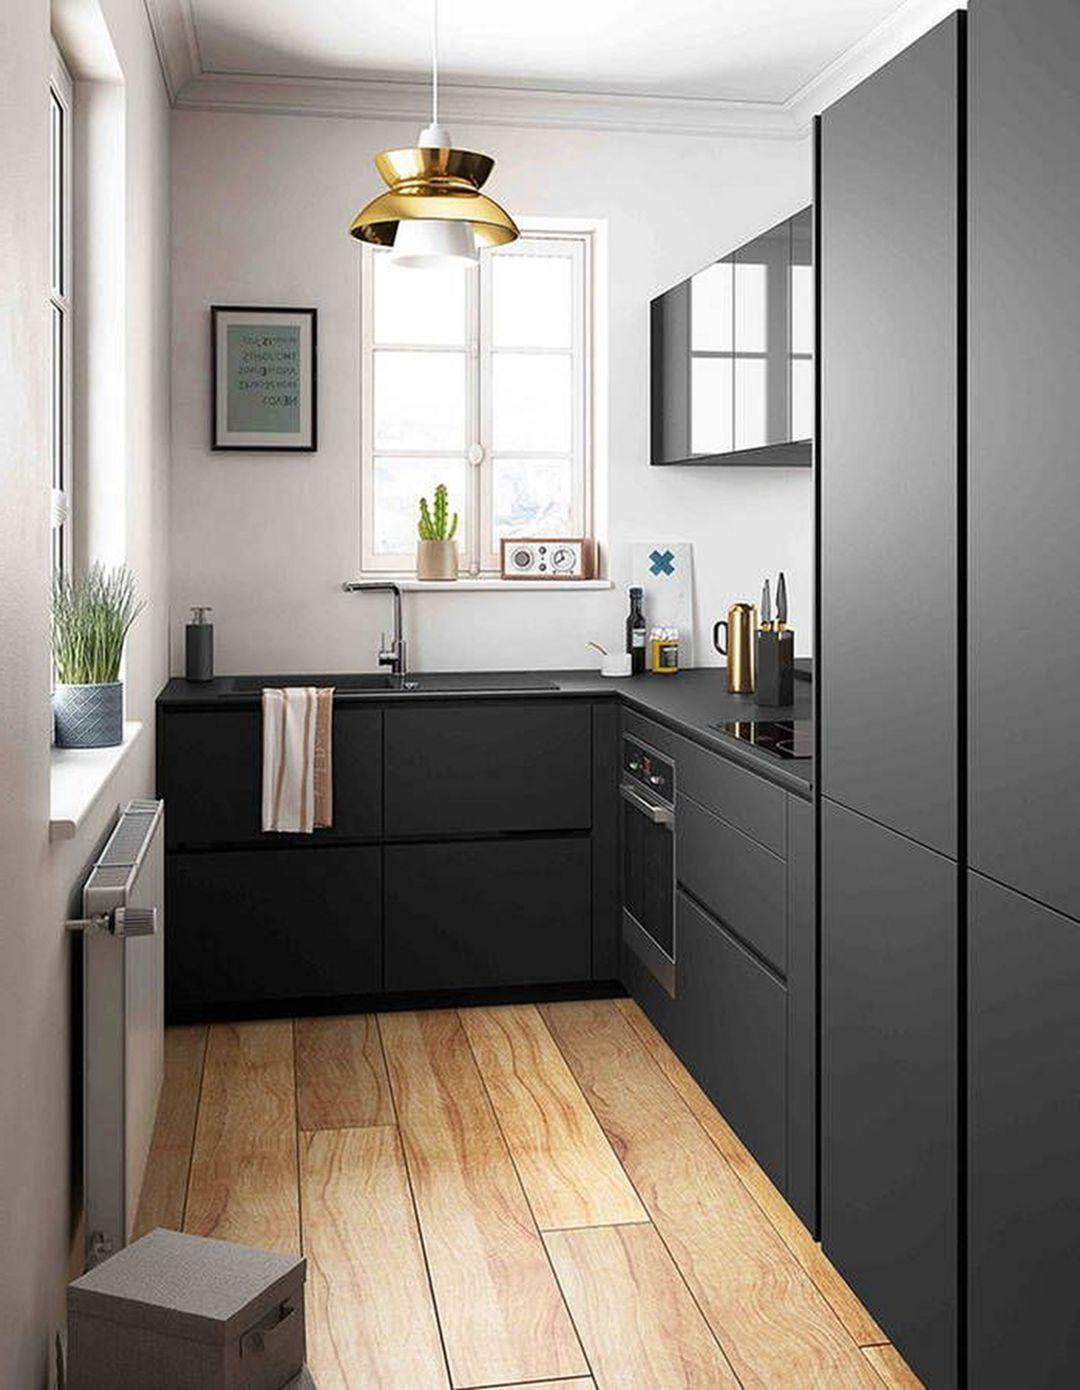 2021 small modern kitchen ideas (With images) | Konyhai ...